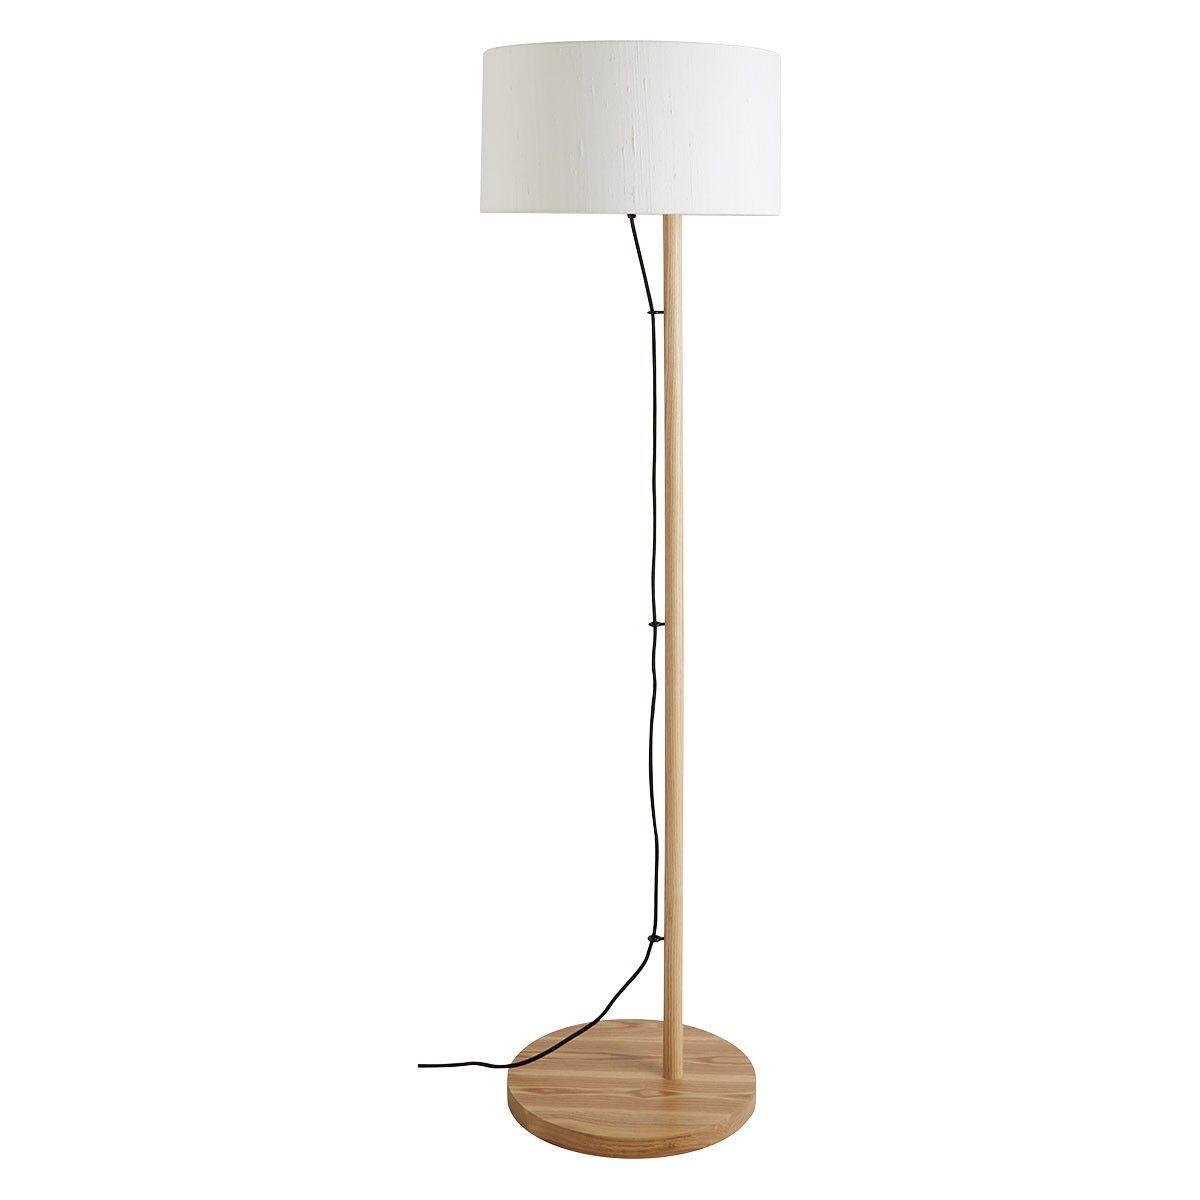 Leigh Oak Wooden Floor Lamp With White Shade Flooringpatternlivingroom Wooden Floor Lamps White Floor Lamp Wood Lamp Base